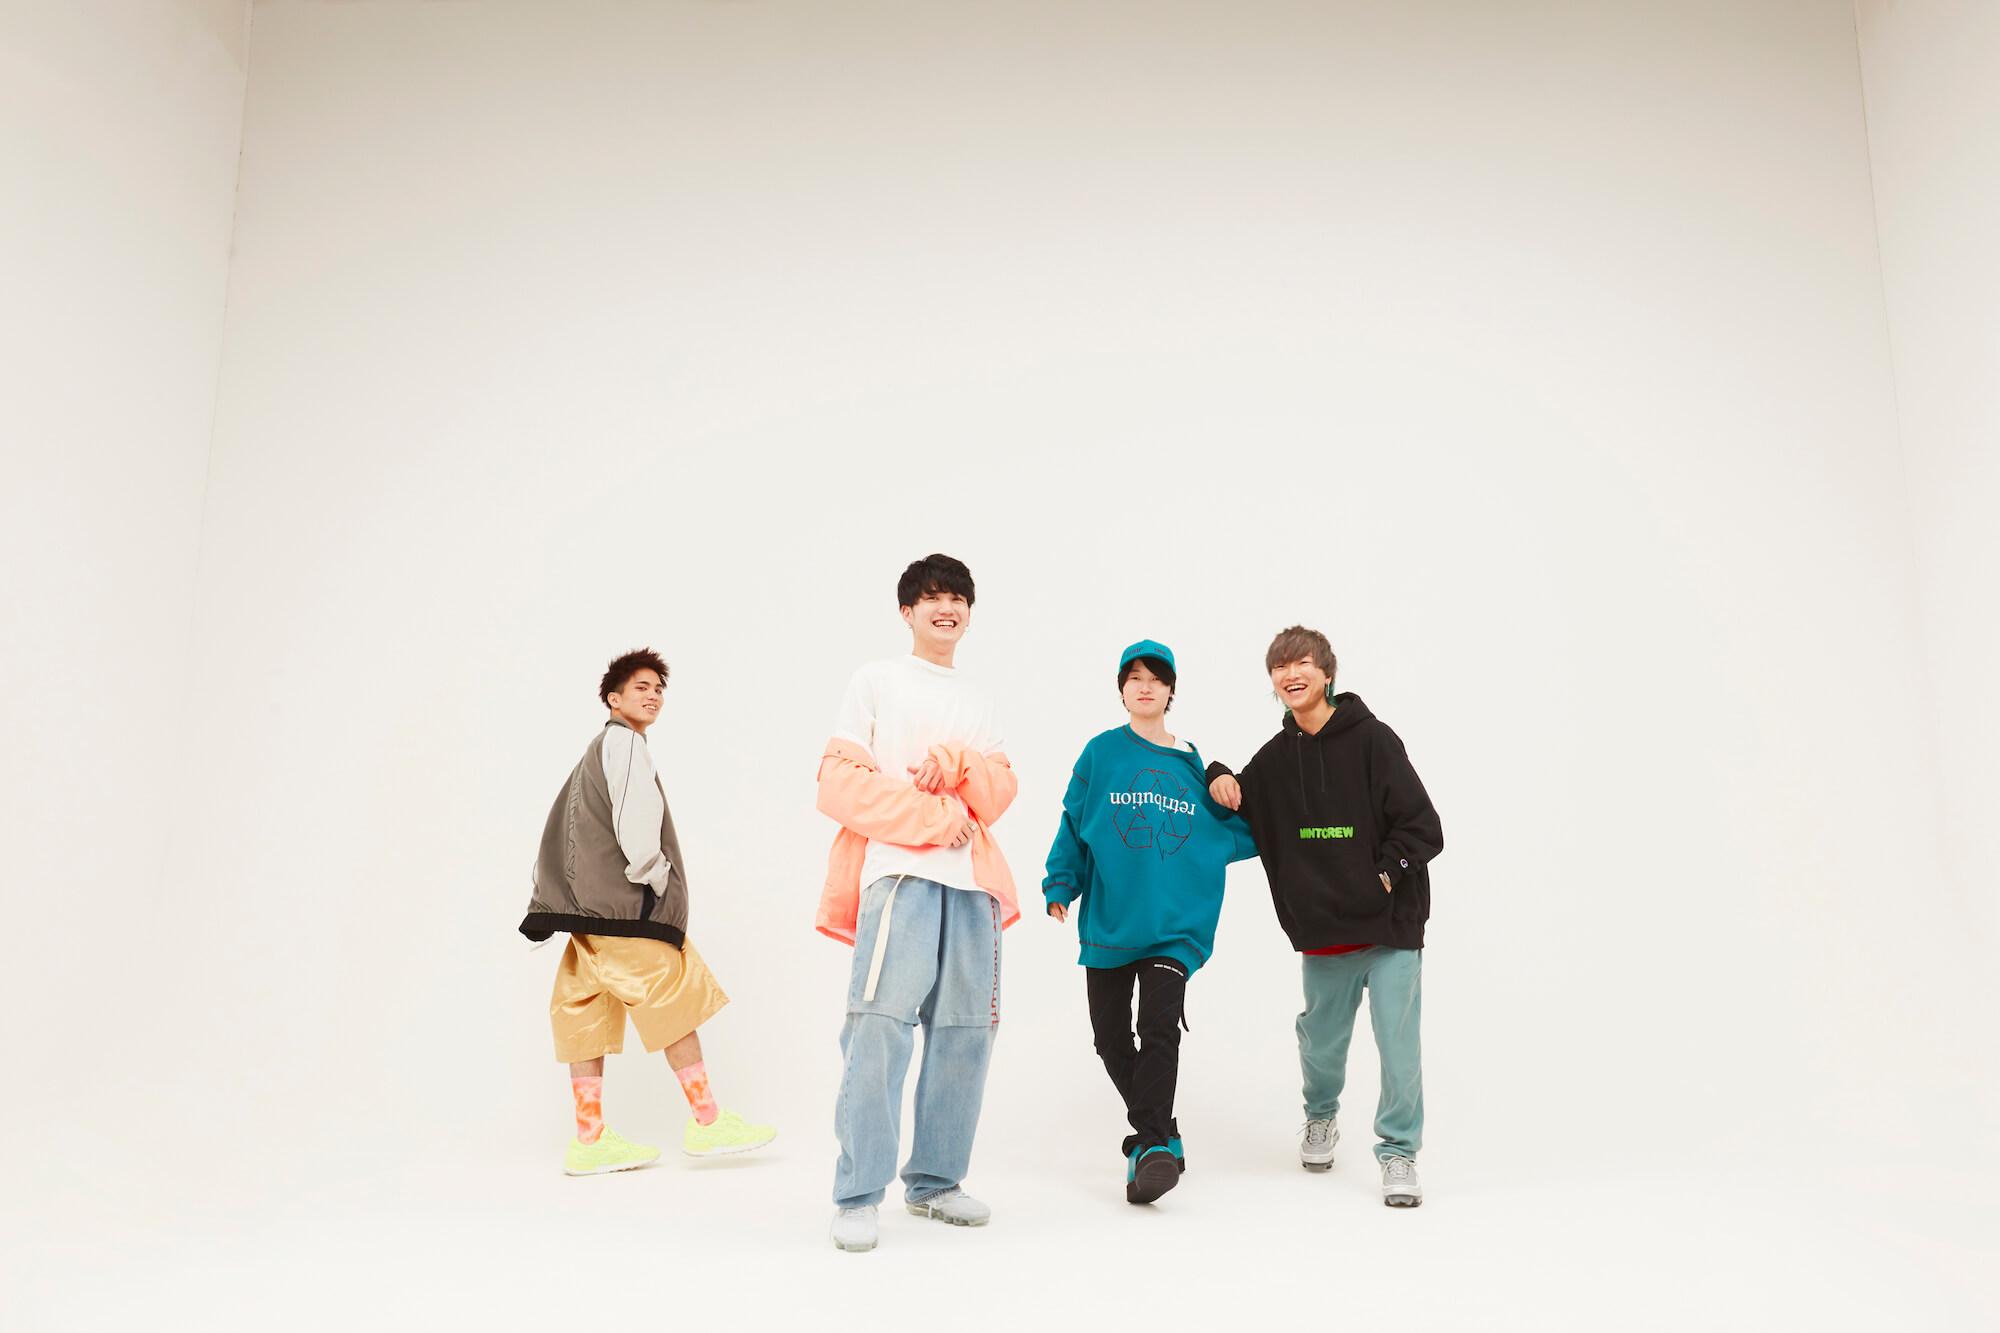 ACE COLLECTION 初デジタルアルバム「December 9」リリース&MV公開